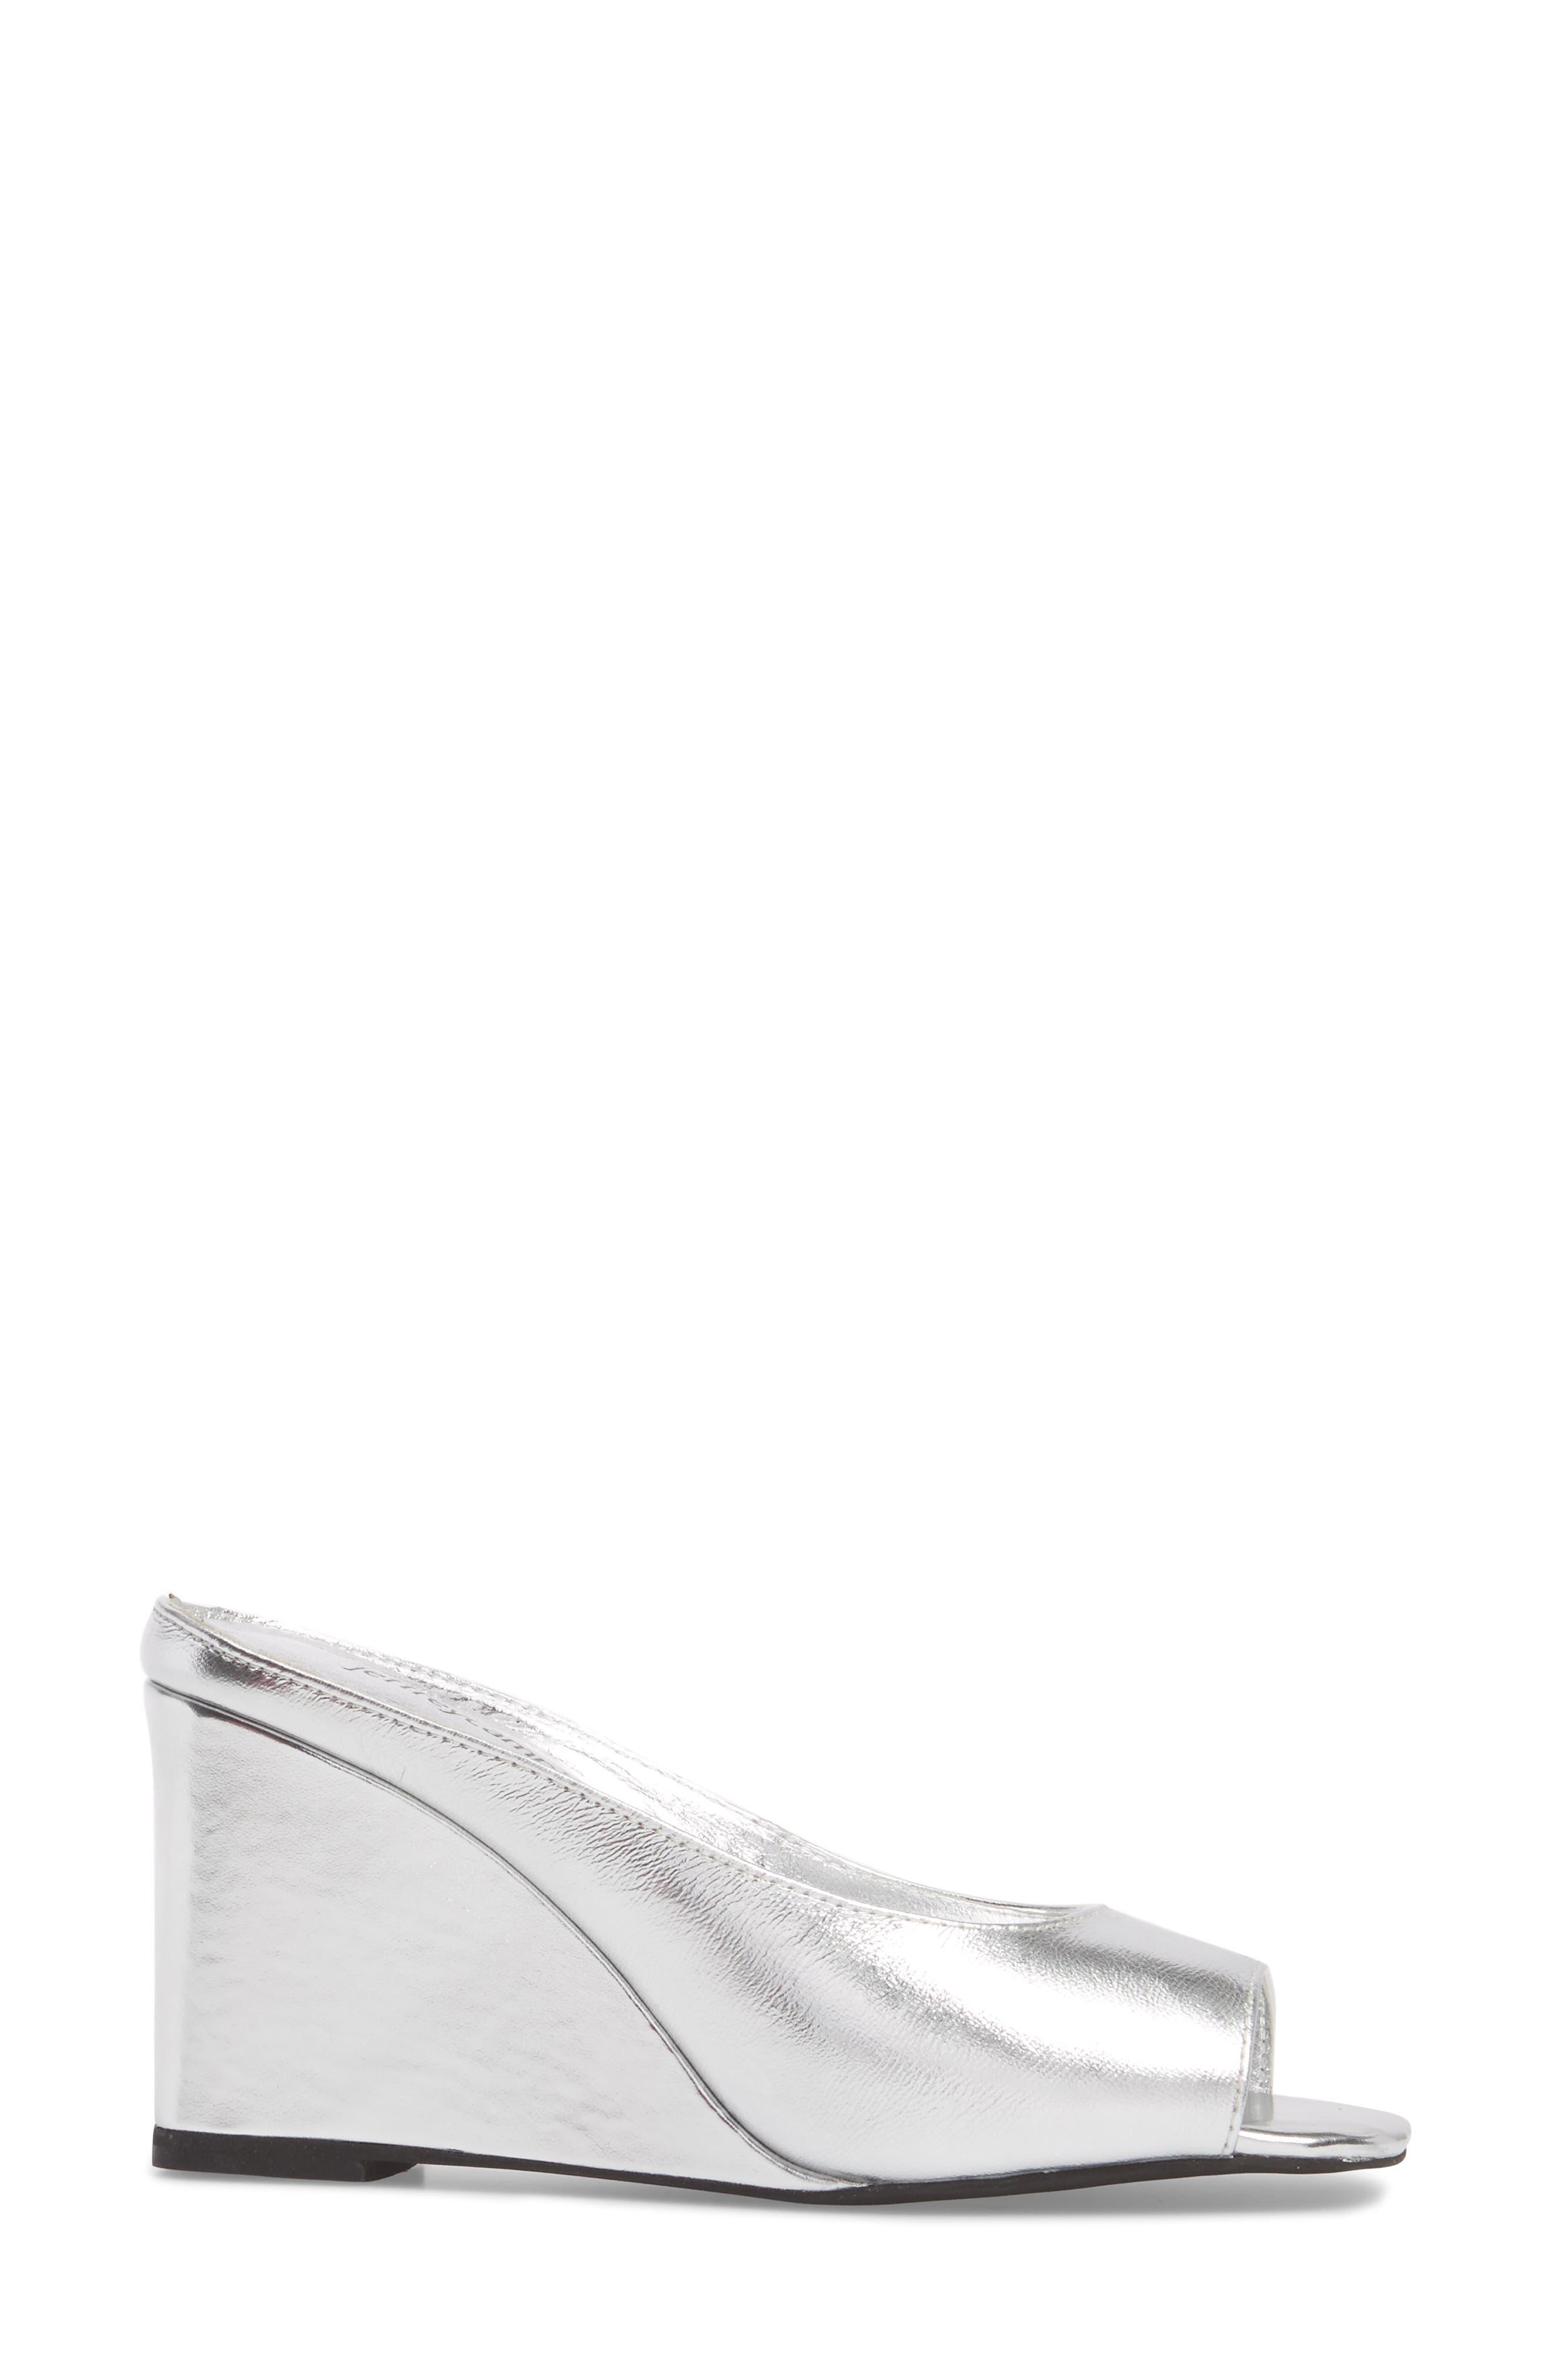 Alternate Image 3  - Jeffrey Campbell Generous Wedge Sandal (Women)